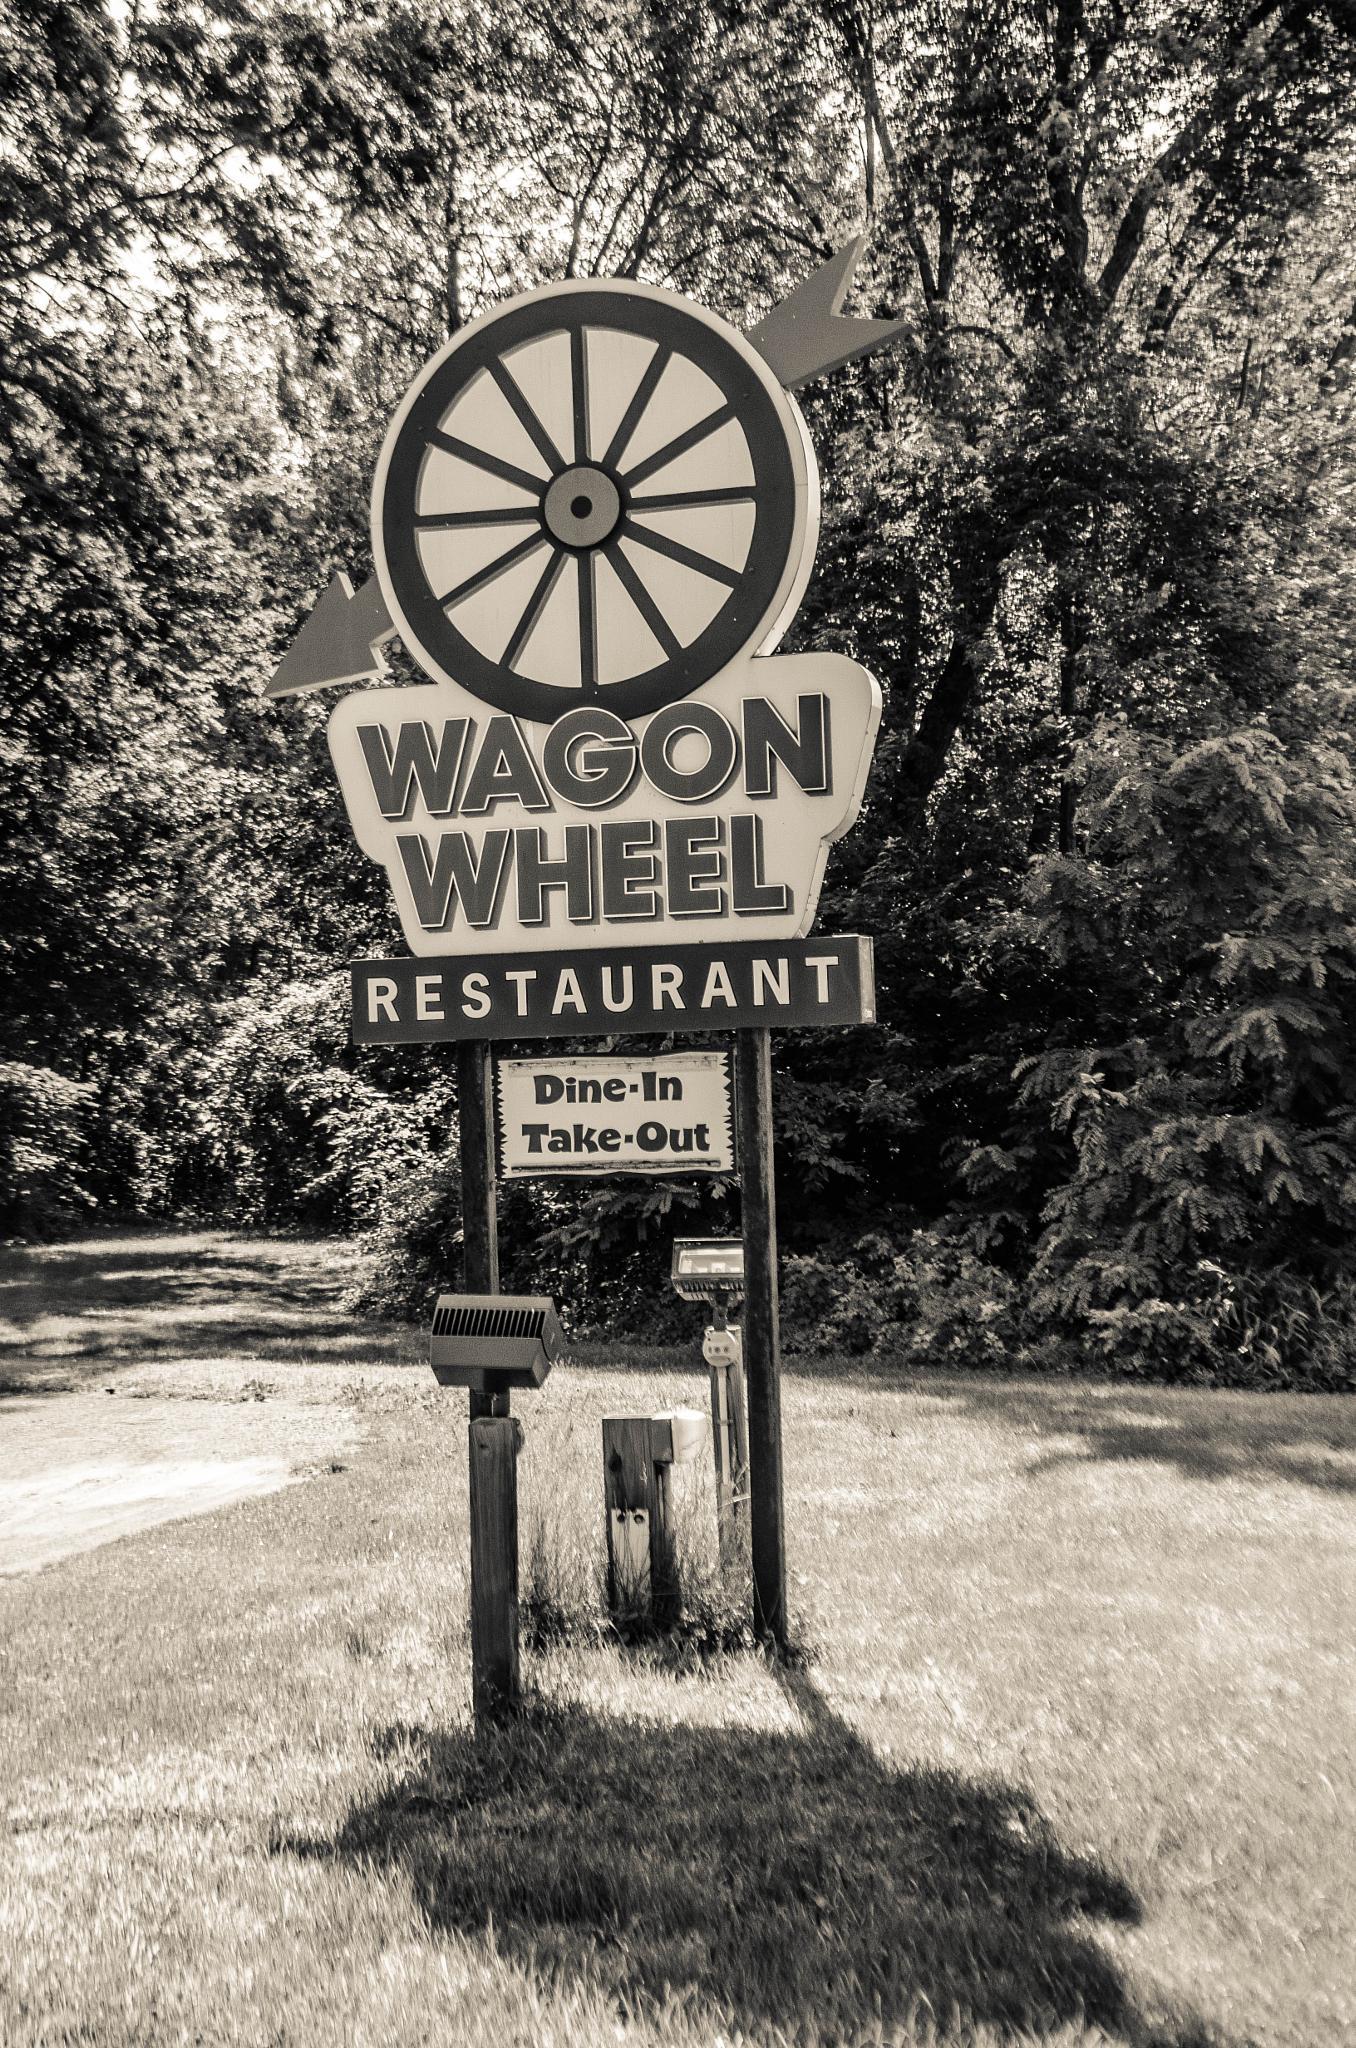 Wagon Wheel Restaurant by davidpinter